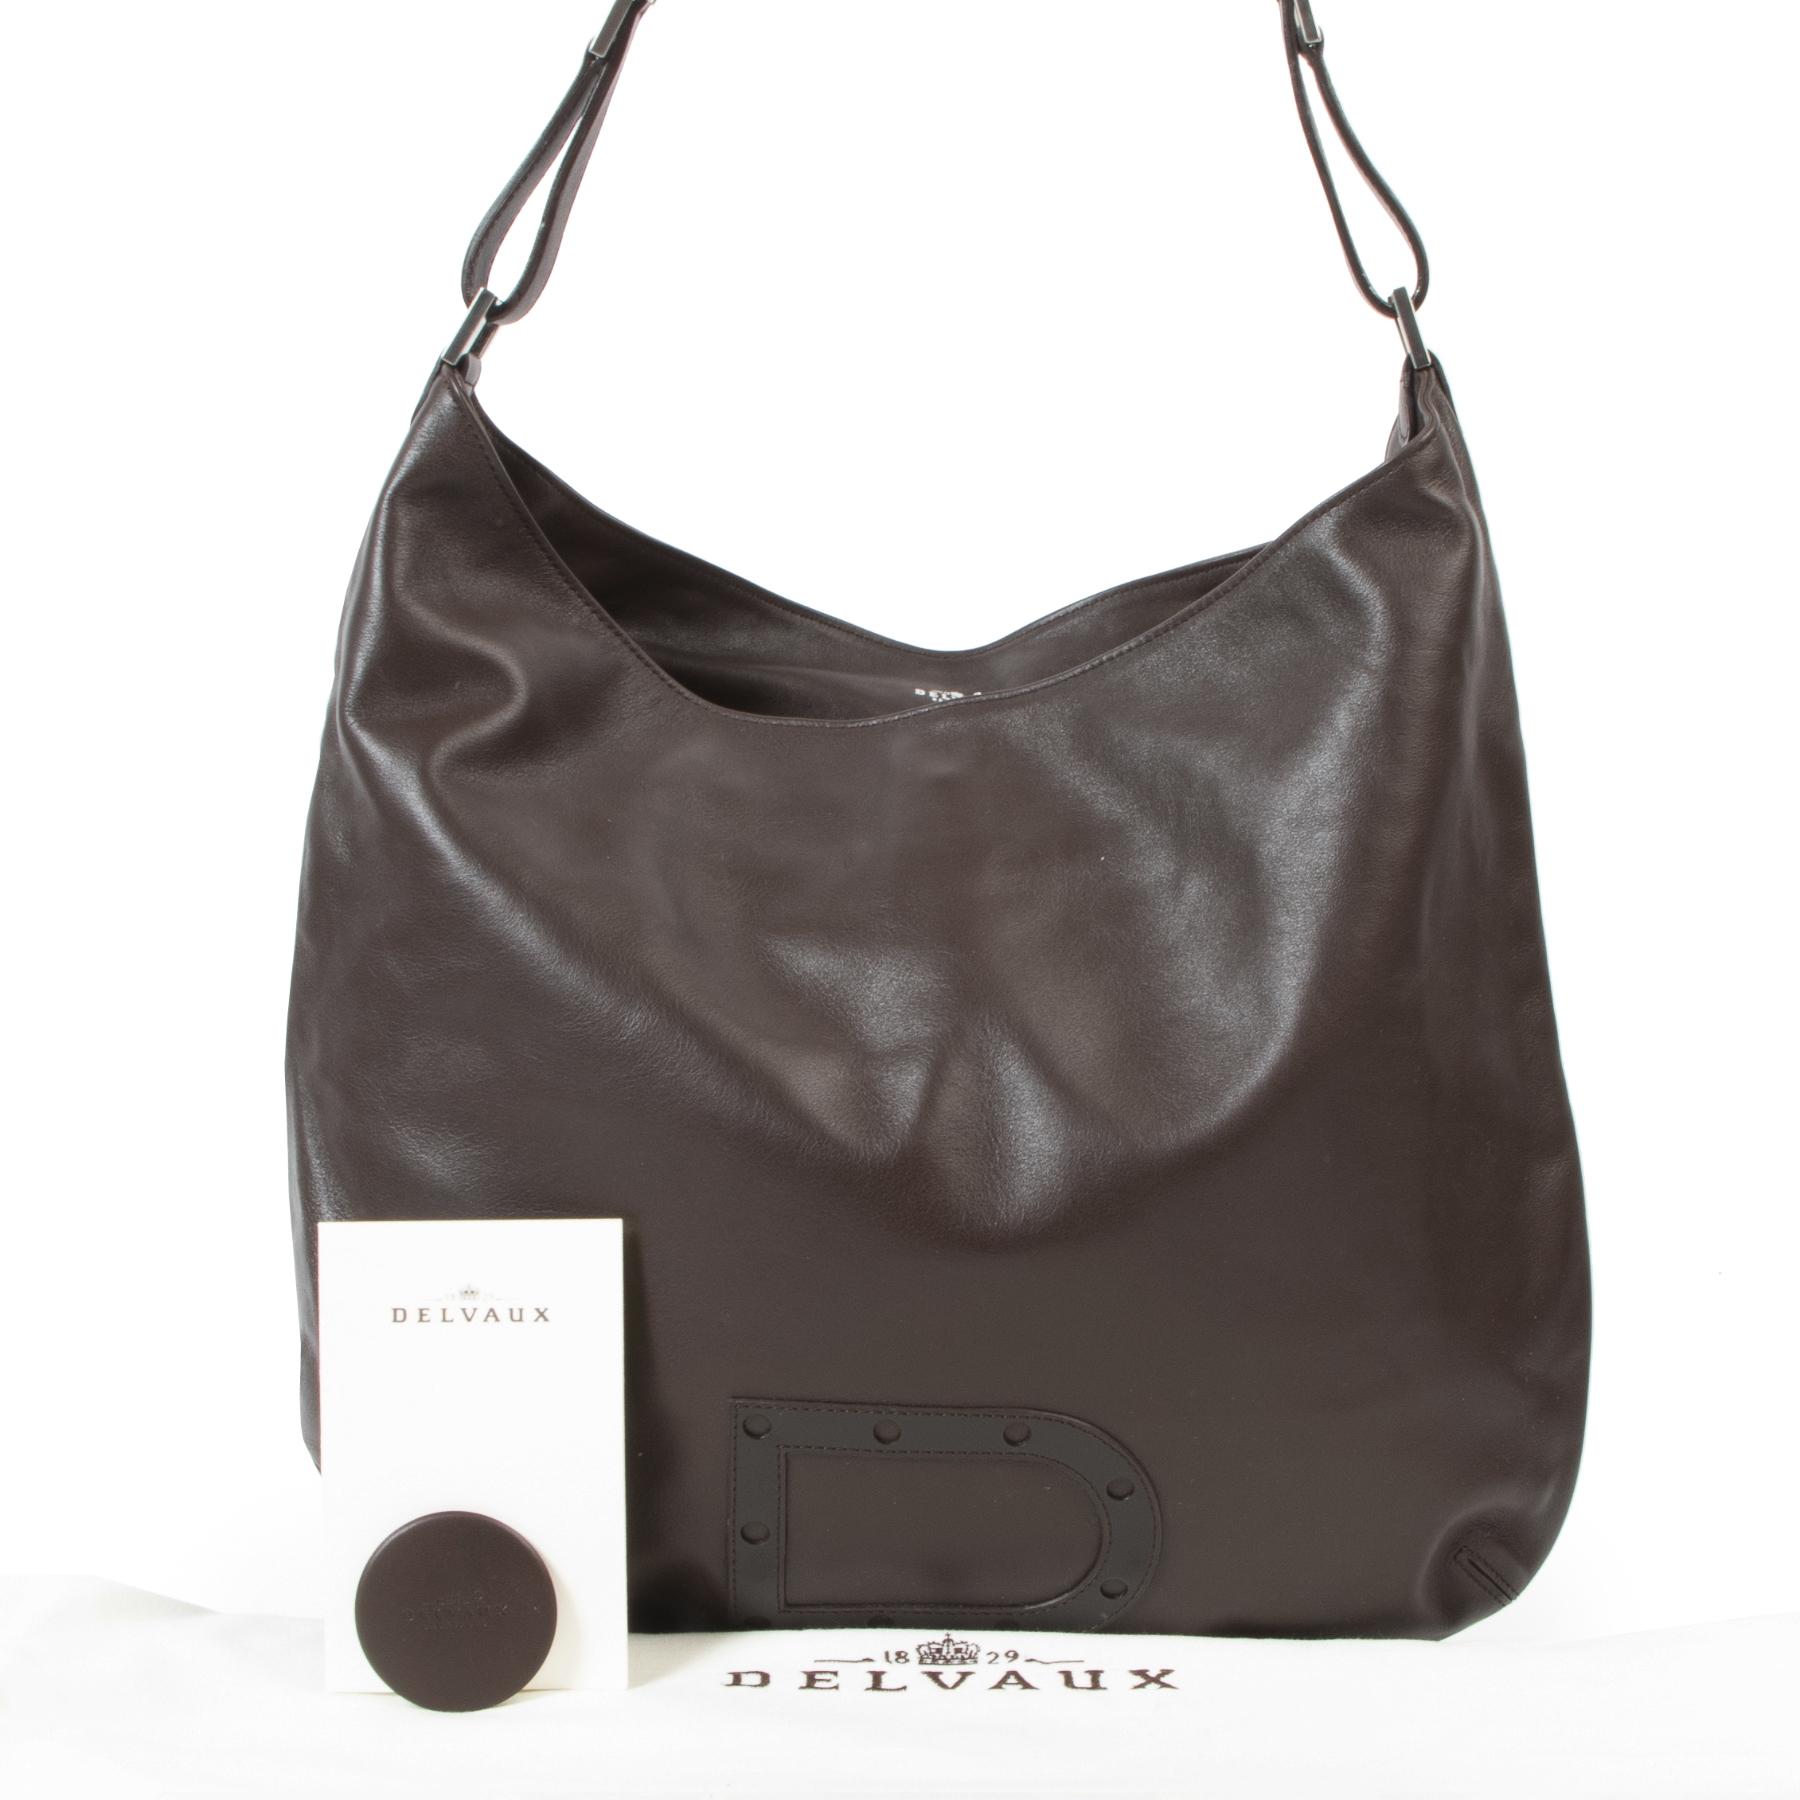 Authentic secondhand Delvaux Brown Le Louise Tote Shoulder Bag designer bags fashion luxury vintage webshop safe secure online shopping